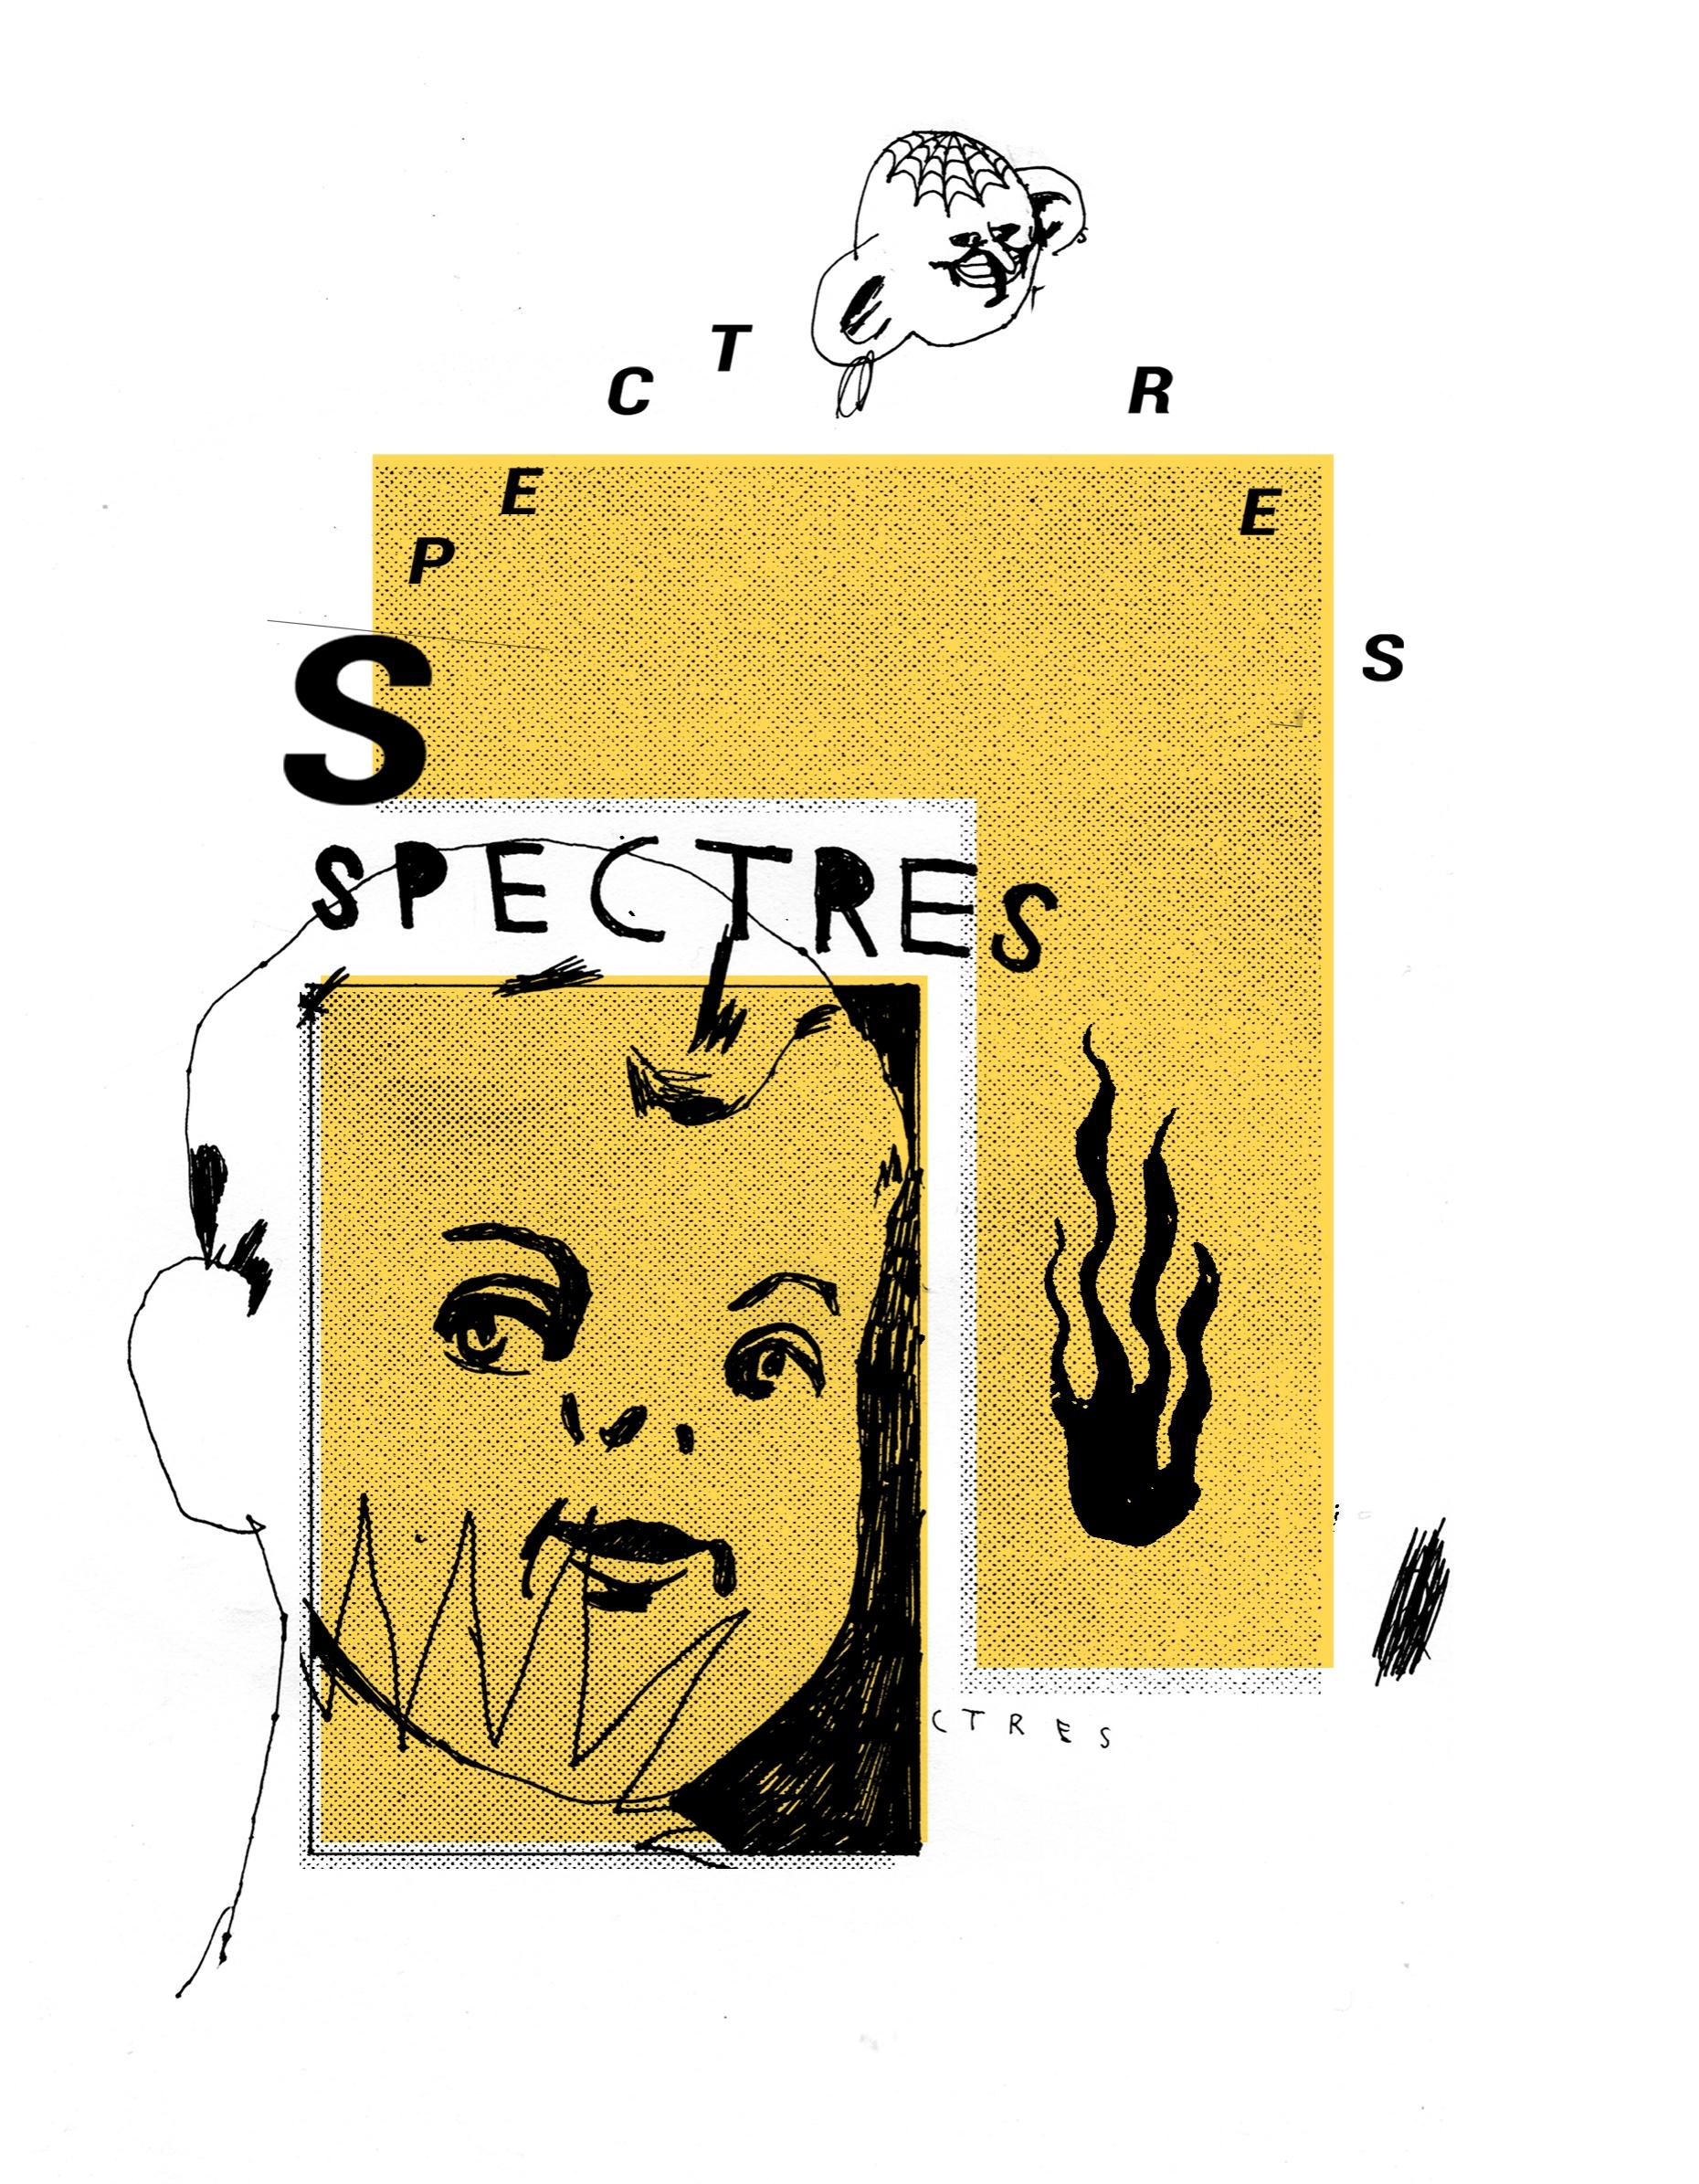 Spectres Germ.jpg